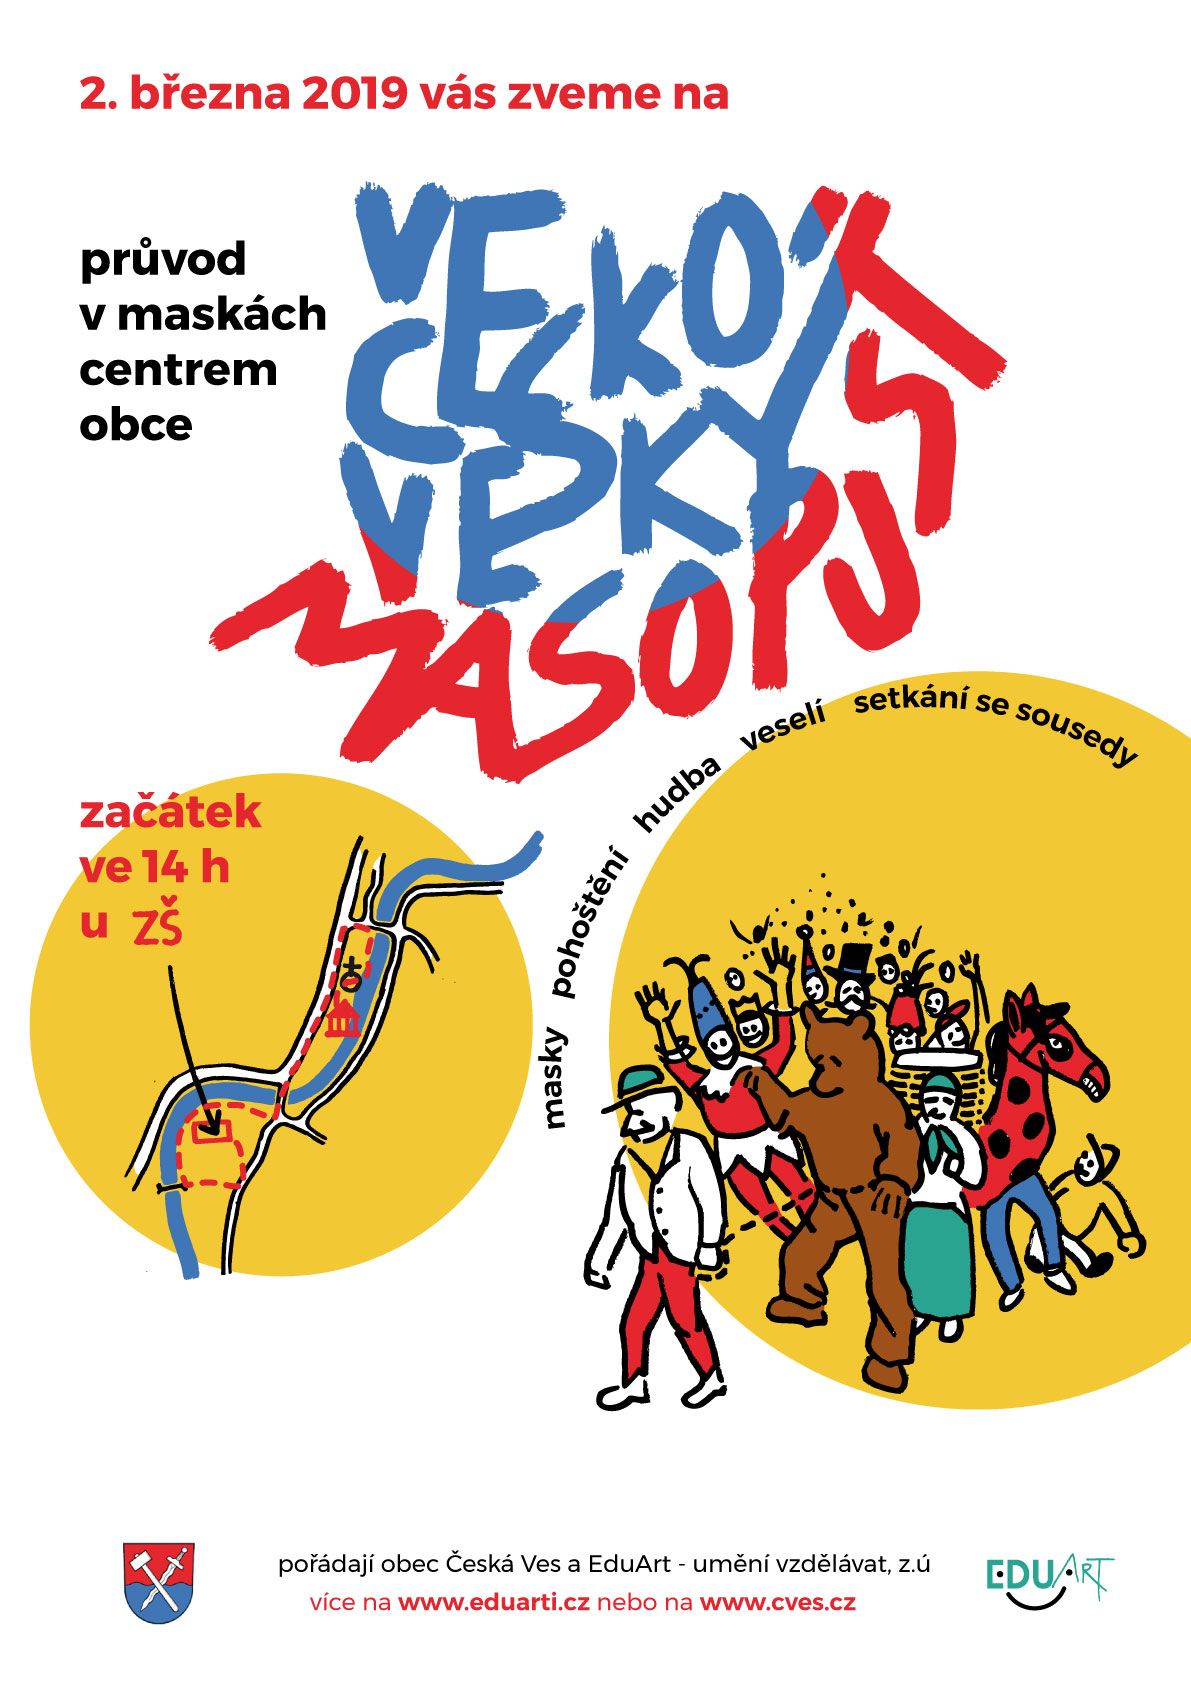 Zveme vás na Českoveský Masopust!